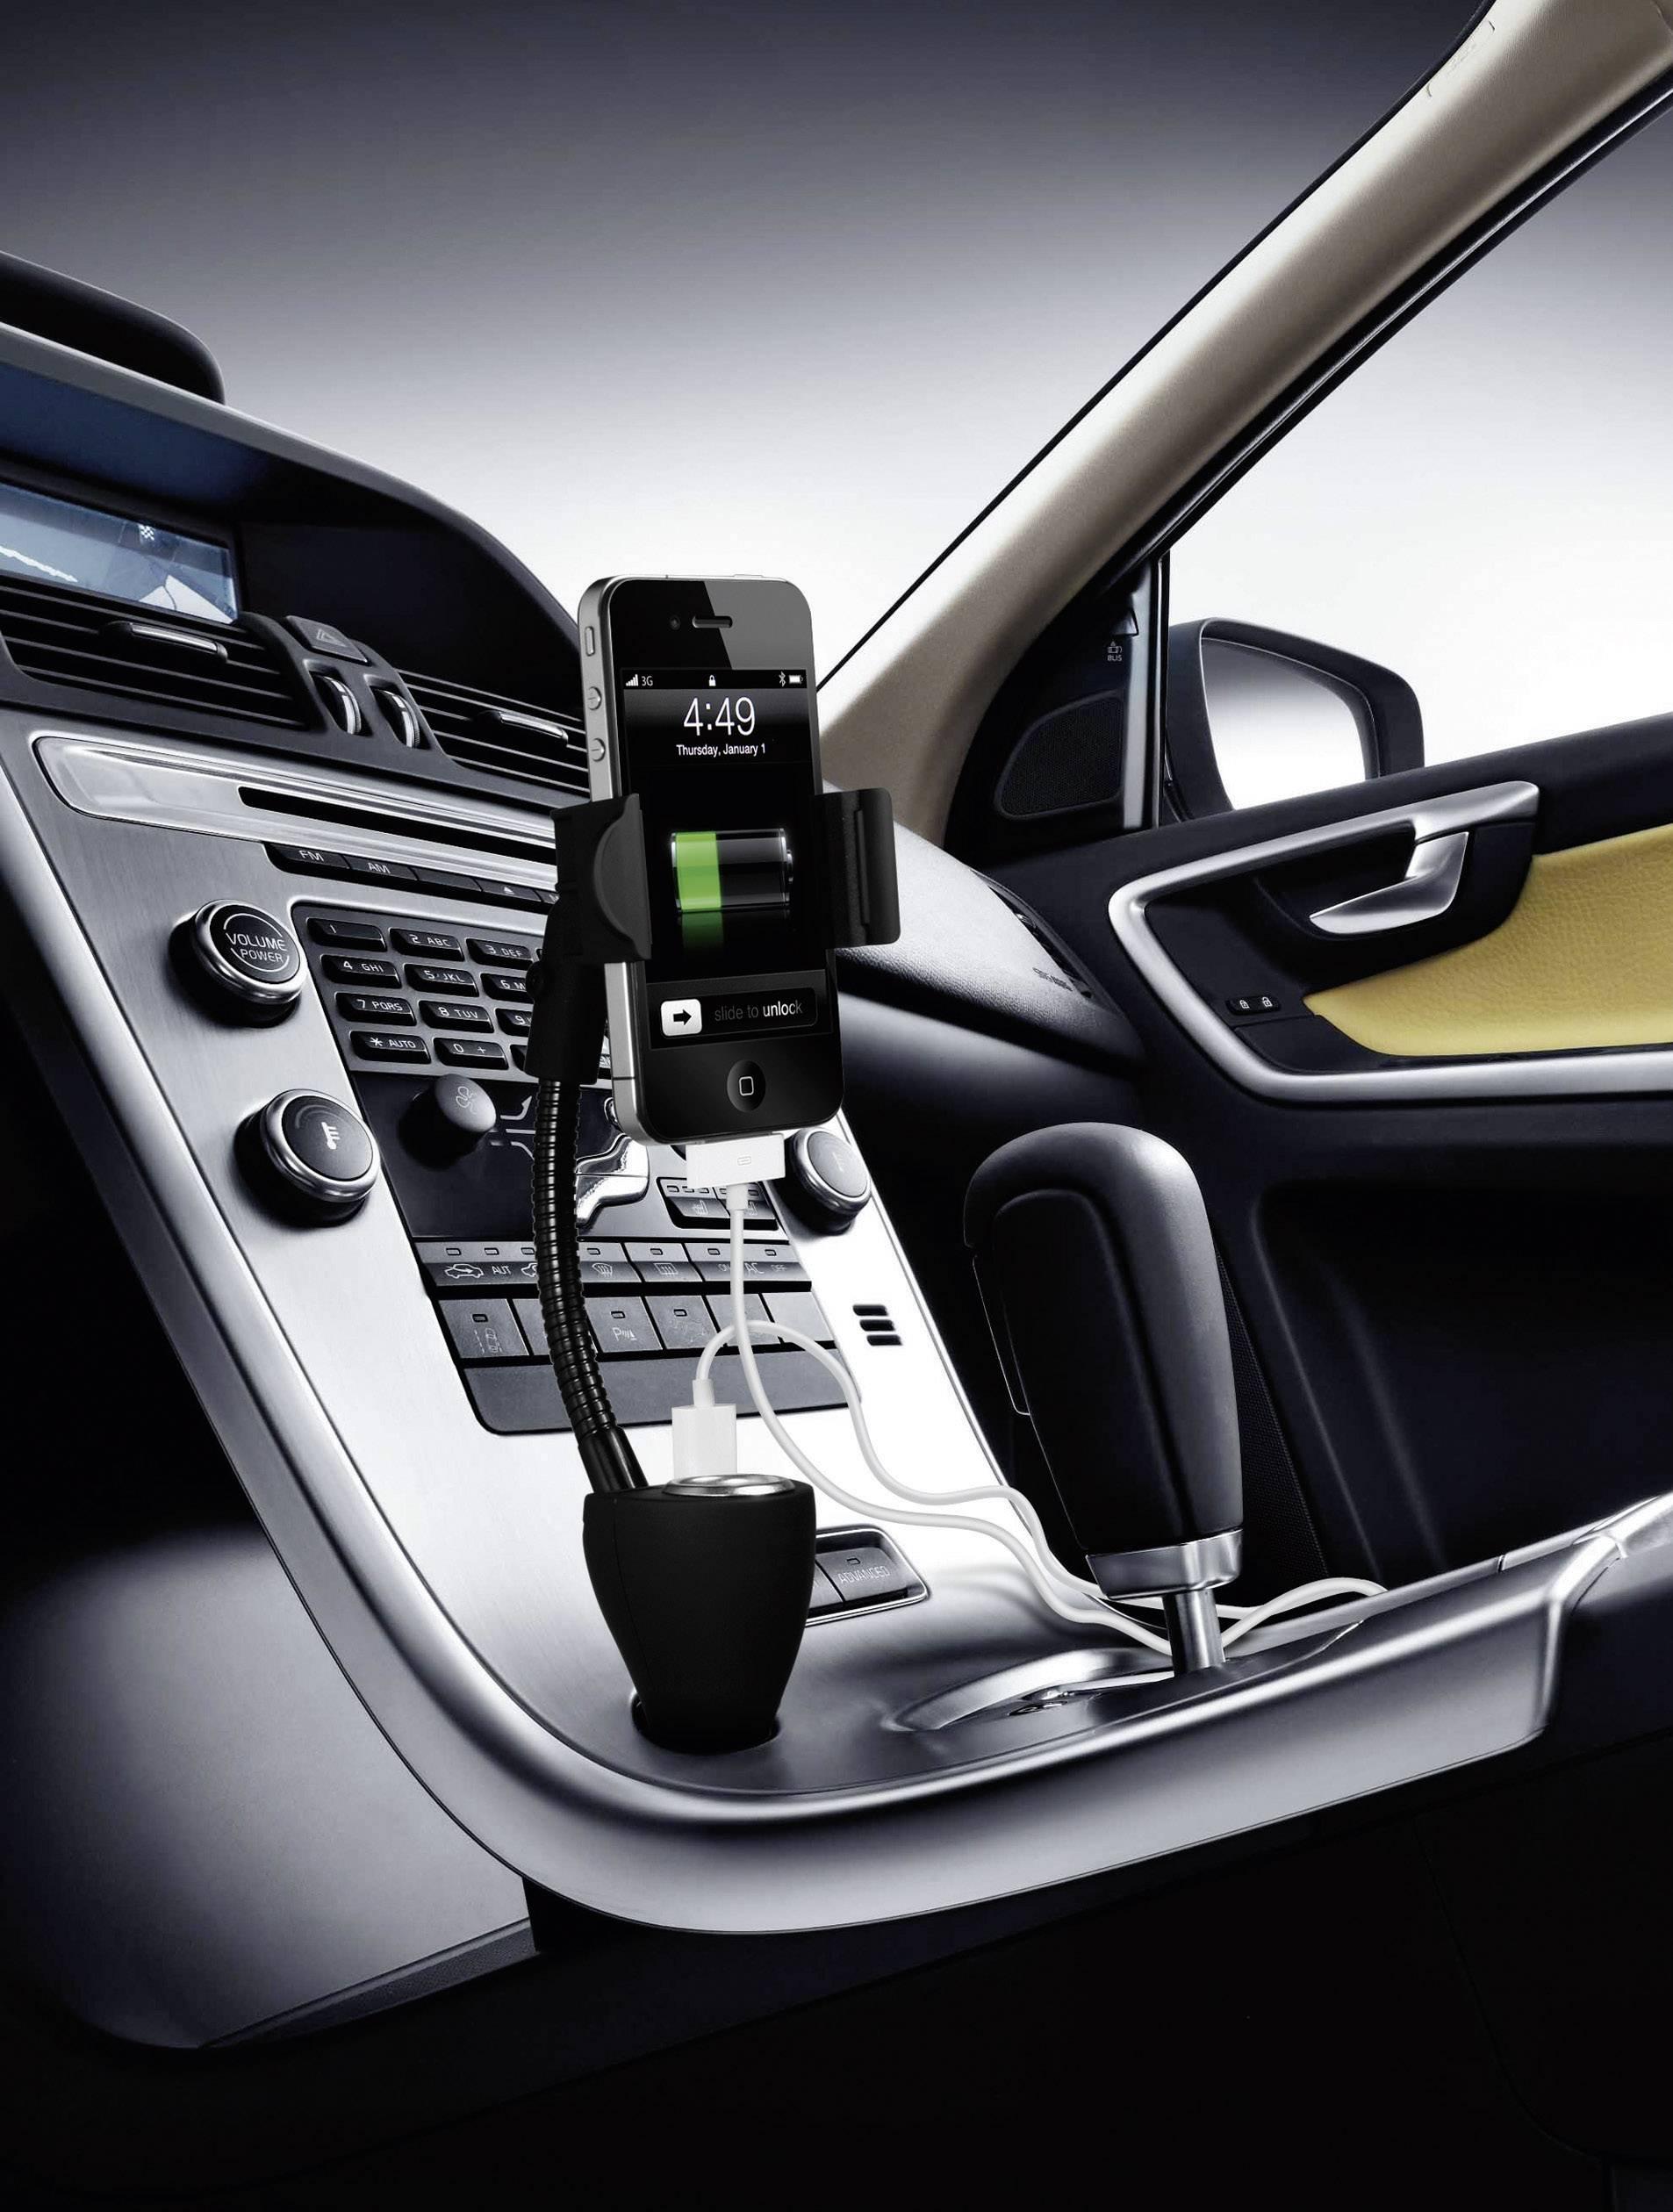 Univerzálna nabíjačka a držiak do auta Technaxx TE06